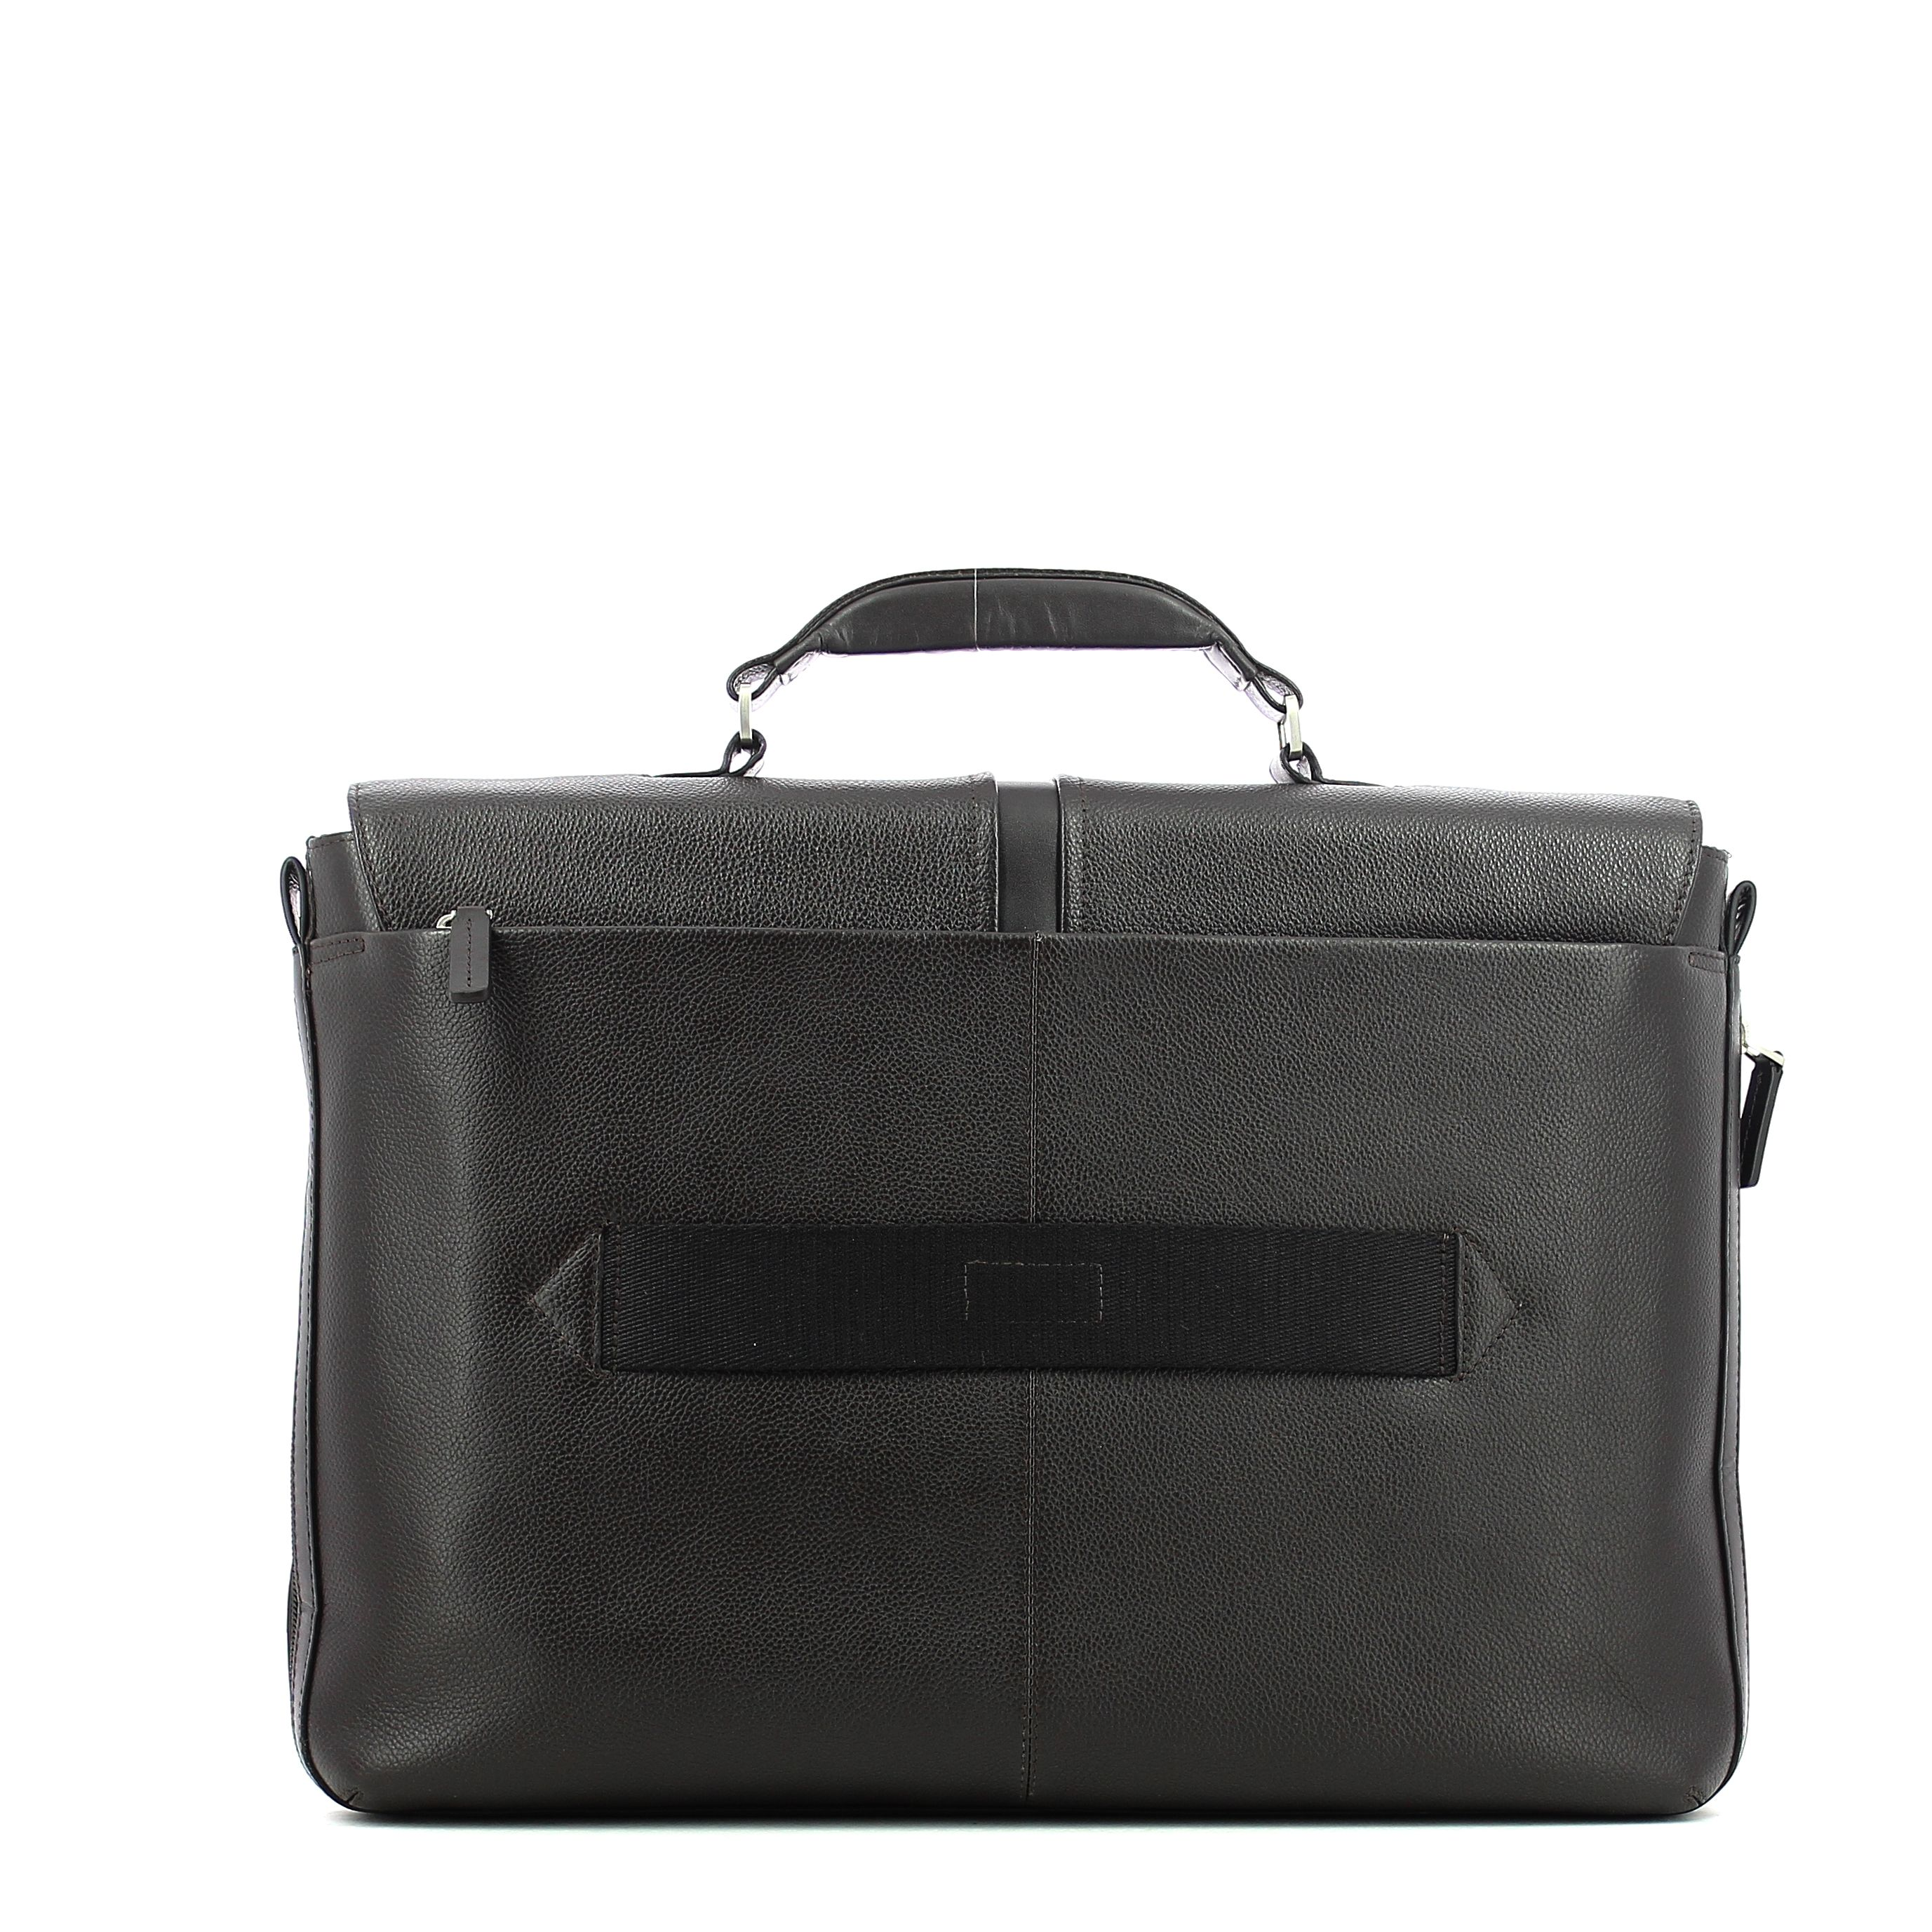 Expandable leather Laptopbag 14.0 Piquadro MARRONE